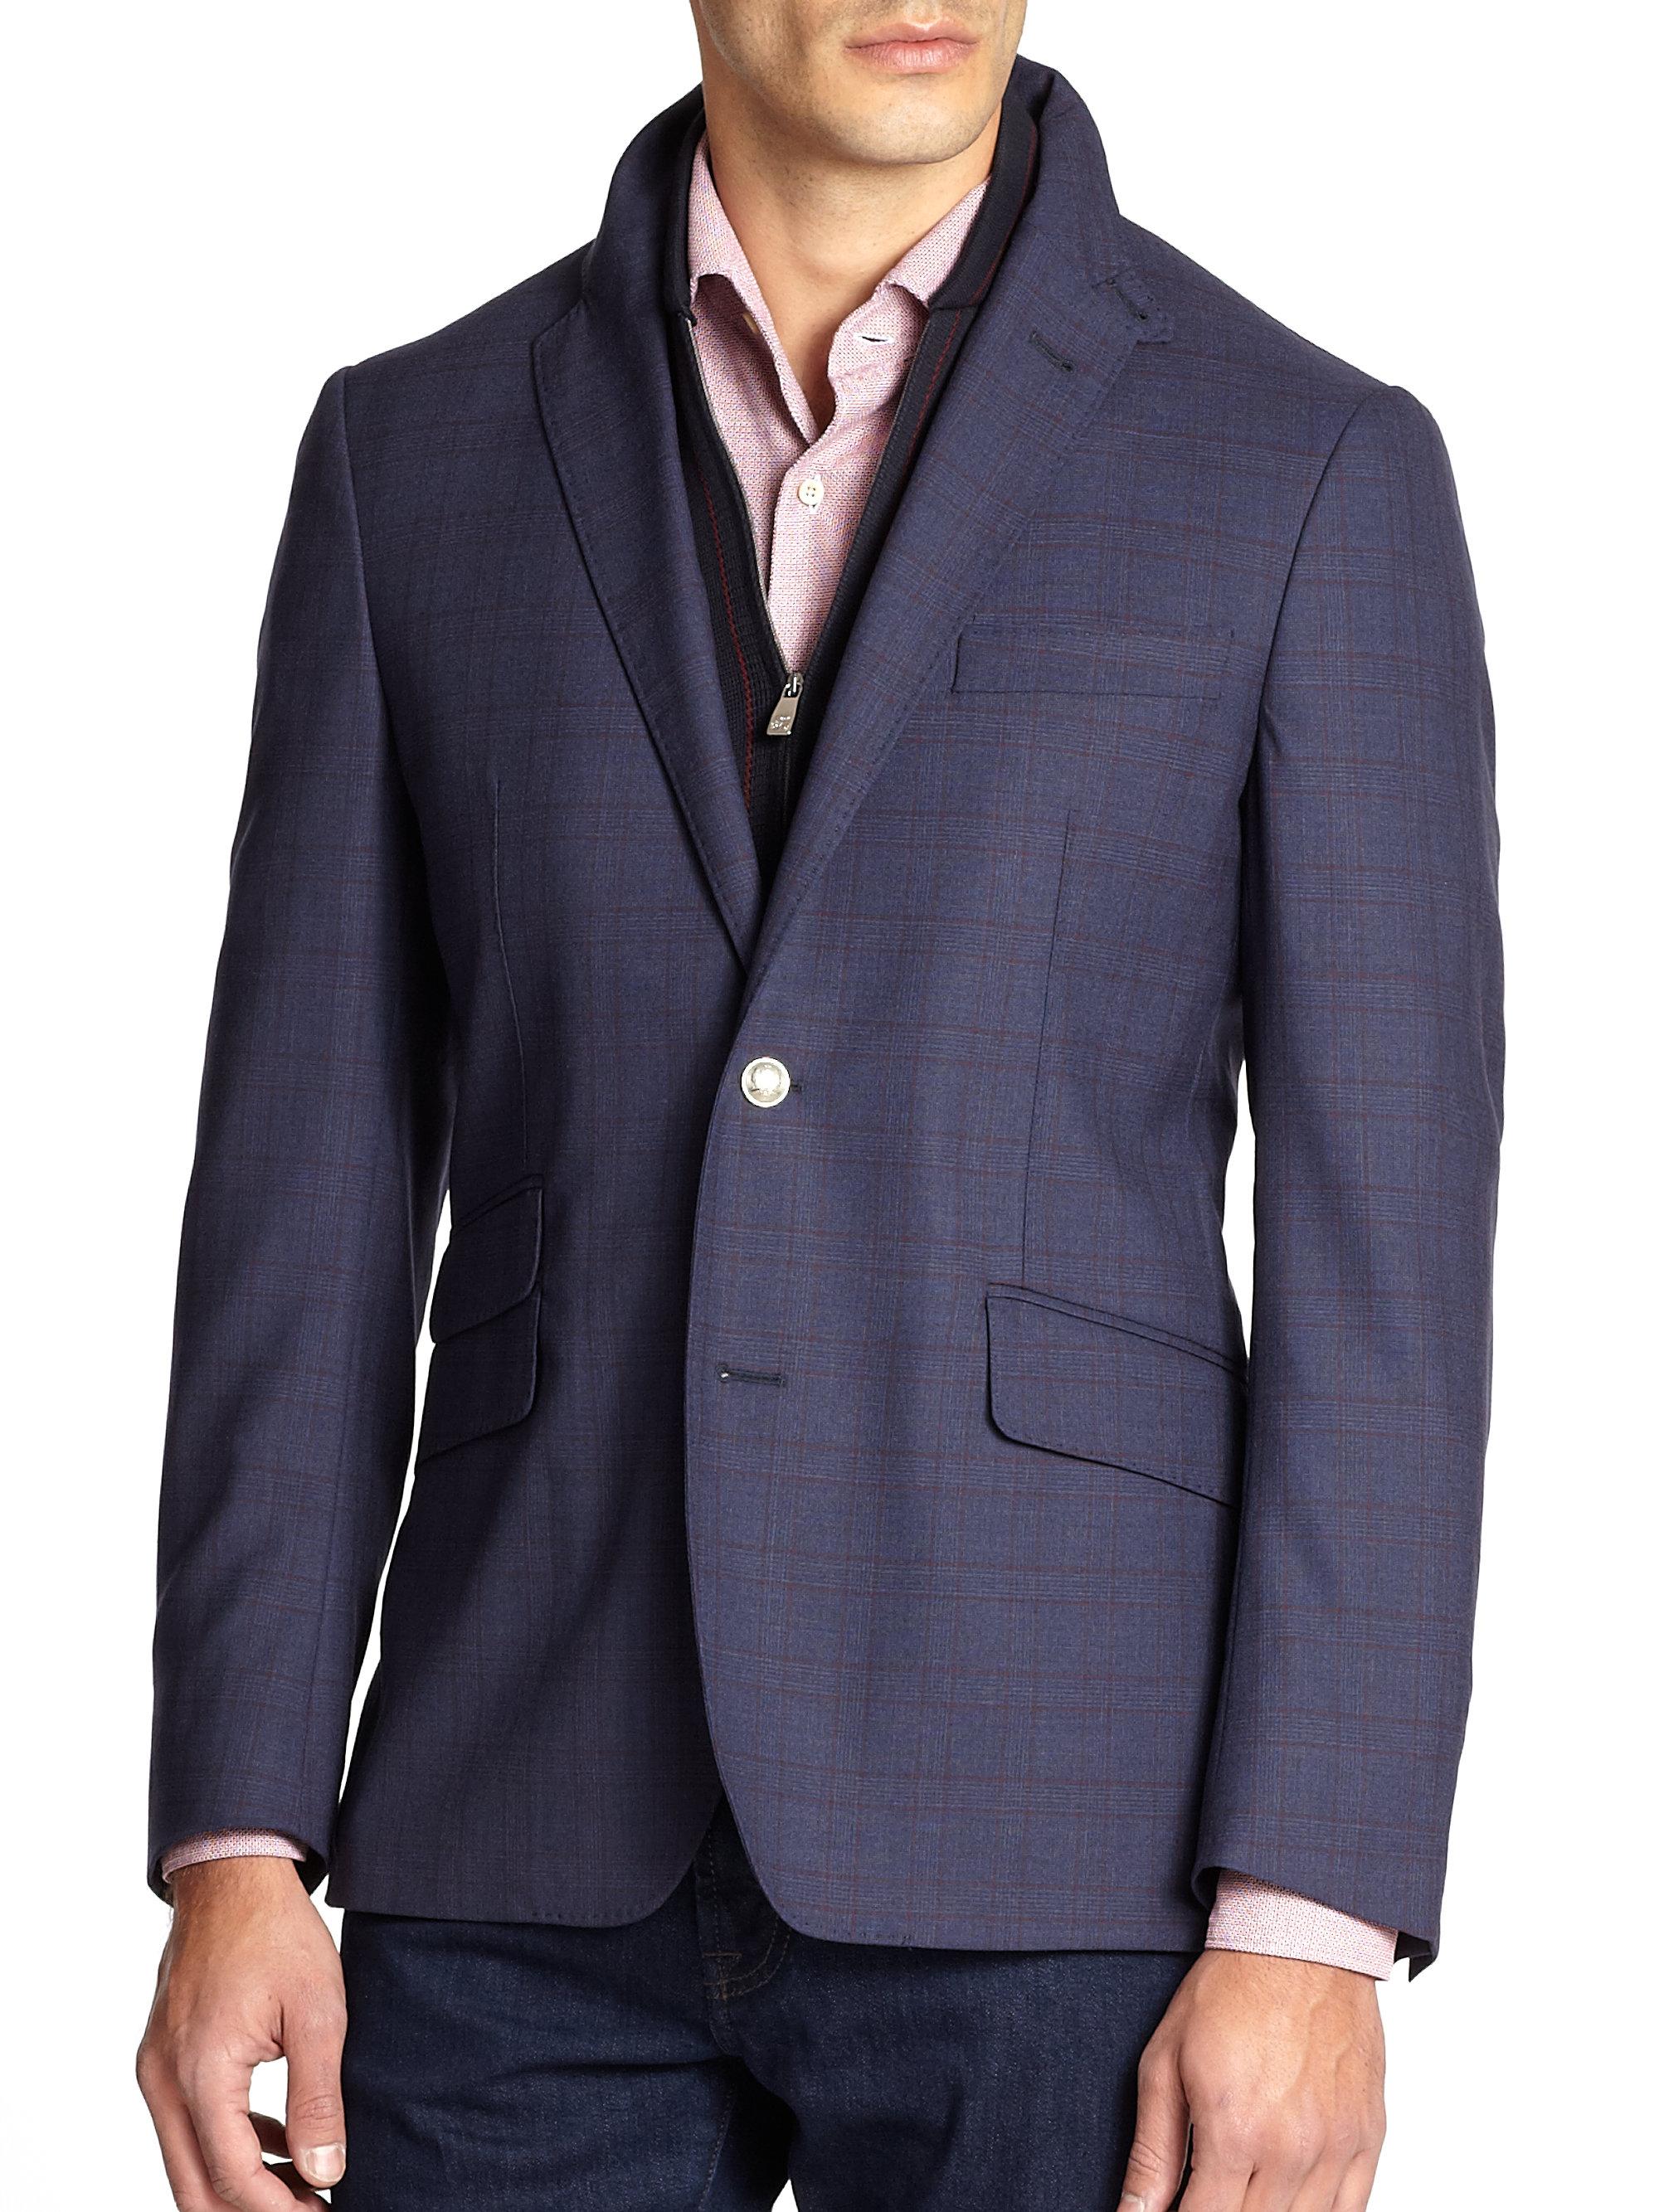 Corneliani Id Plaid Wool Zip Out Vested Sportcoat In Blue